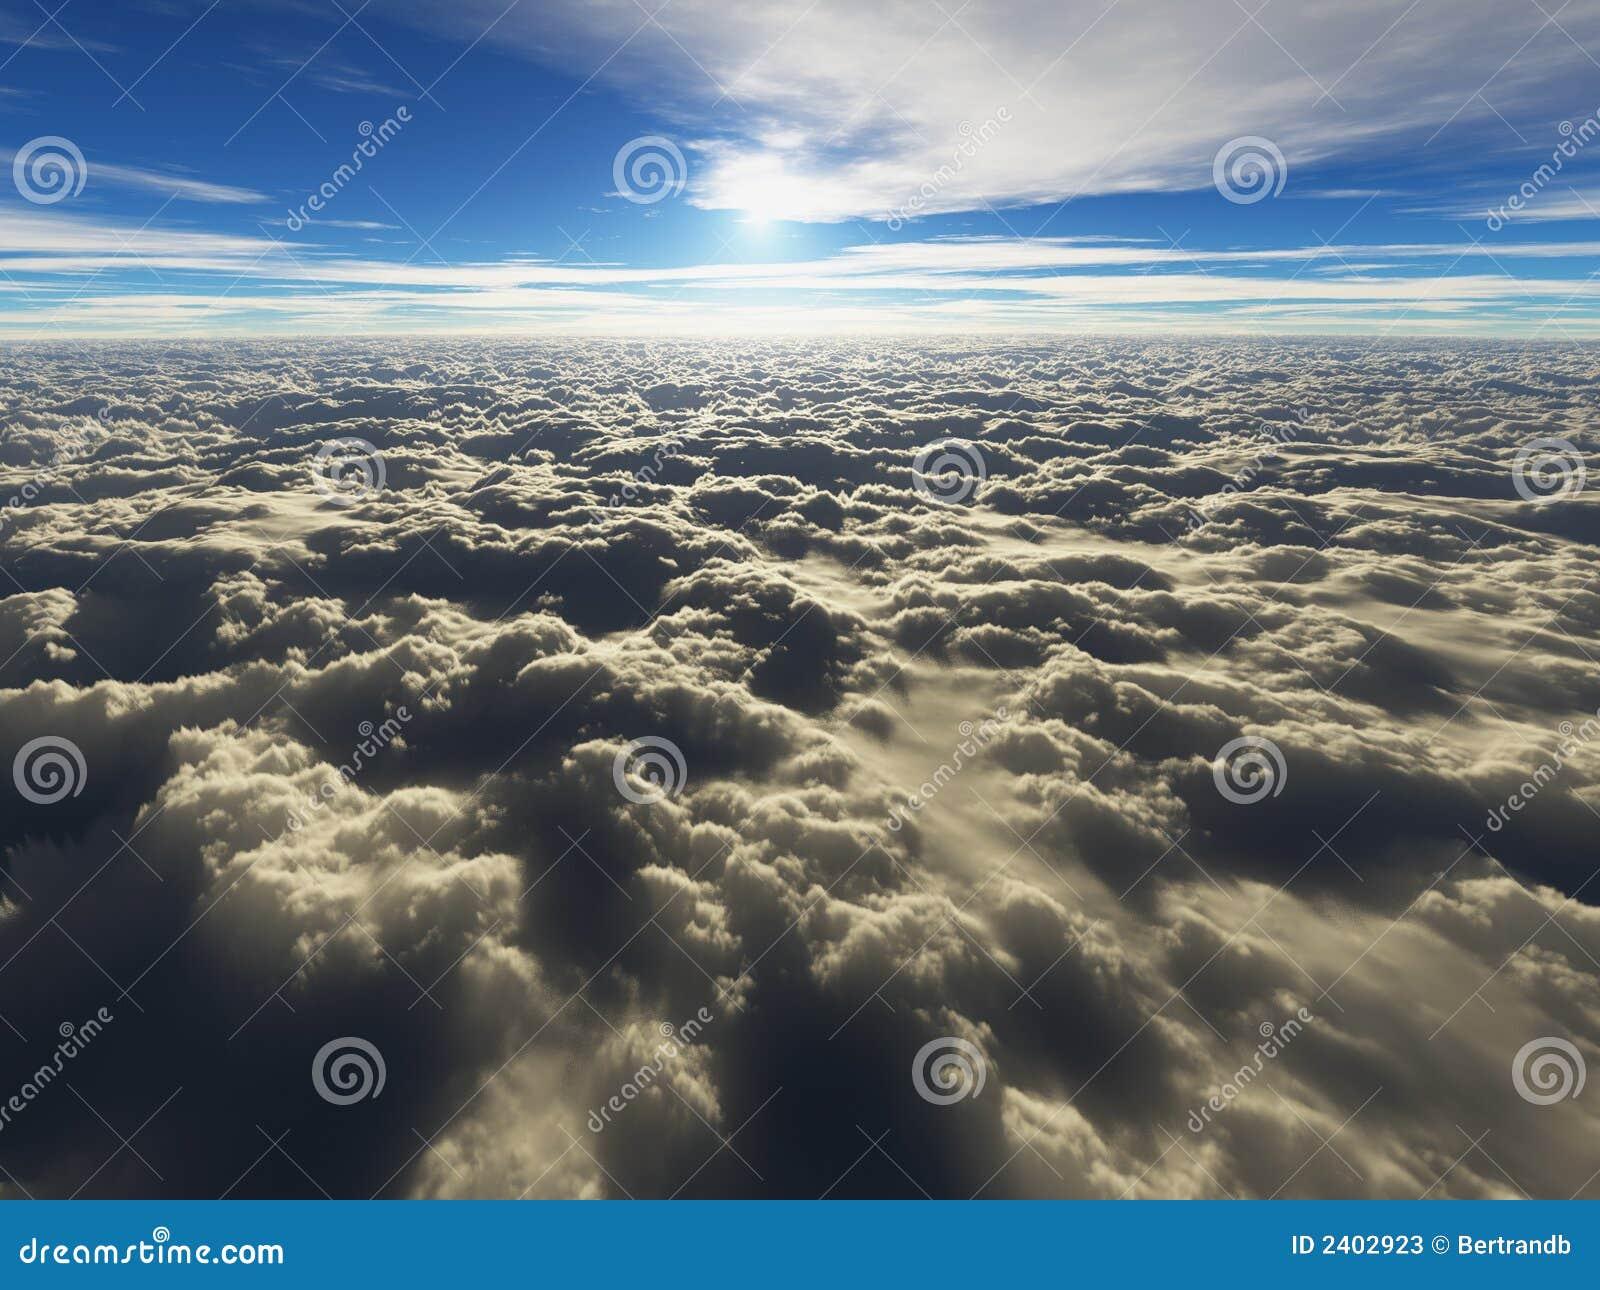 Acima das nuvens - cloudscape